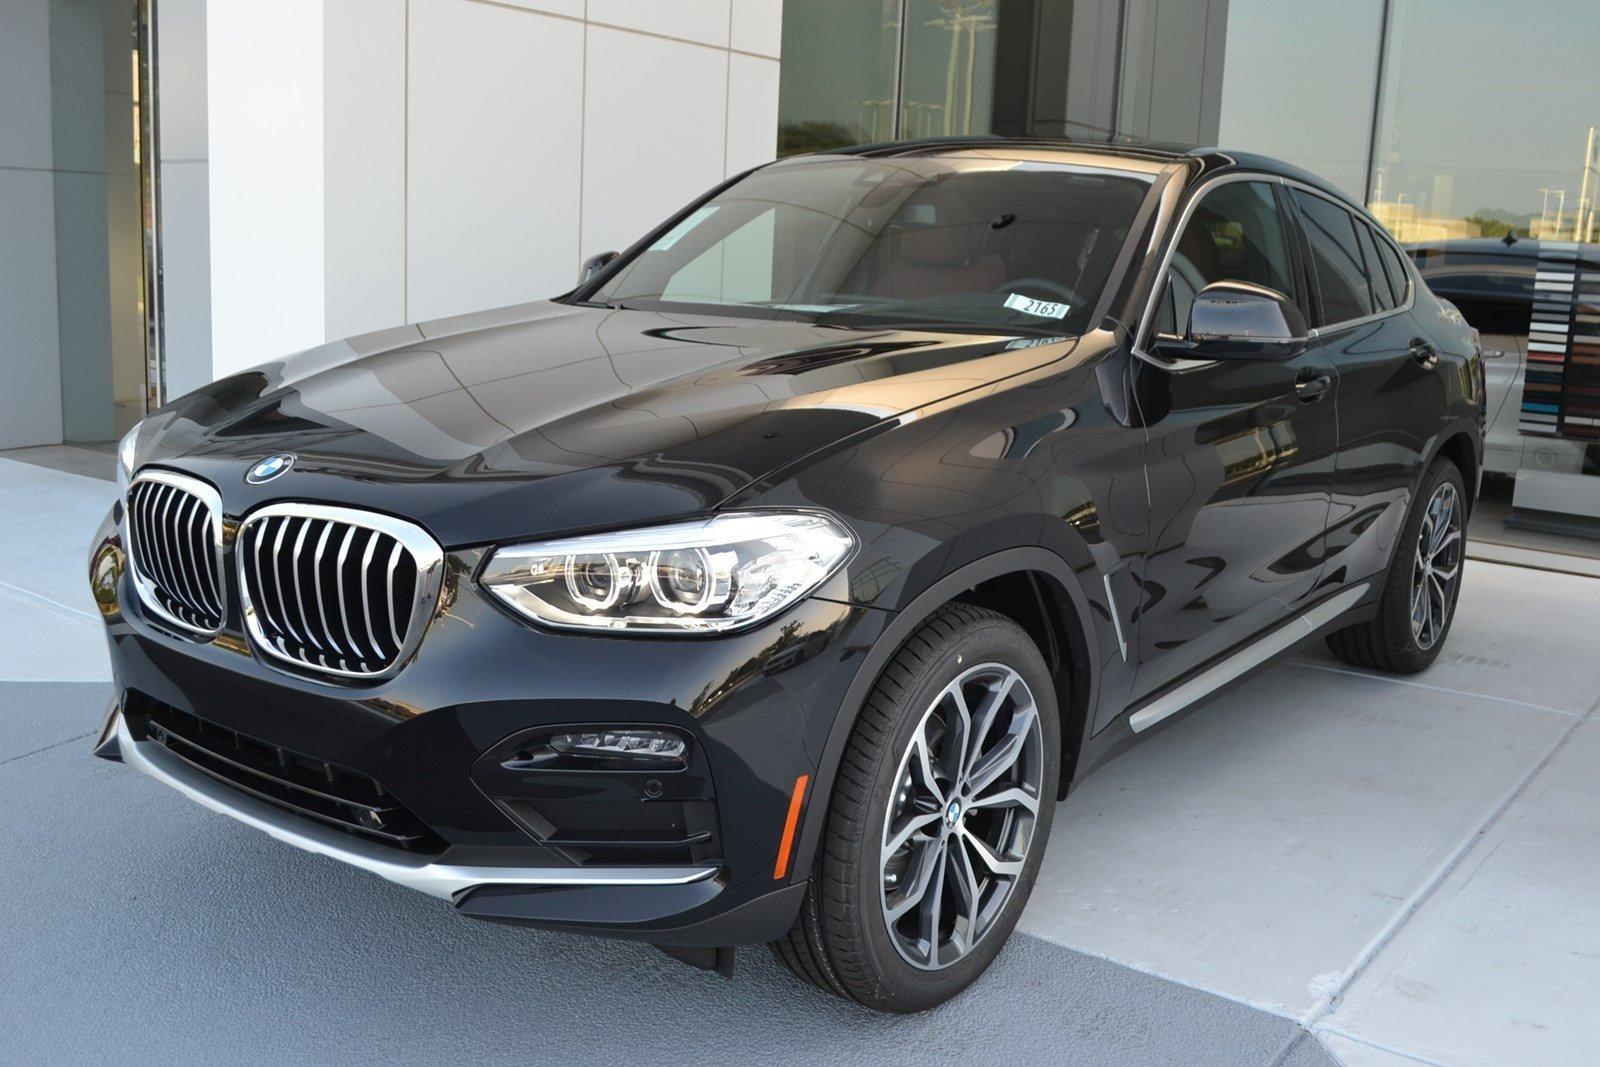 2020 BMW X4 SUV